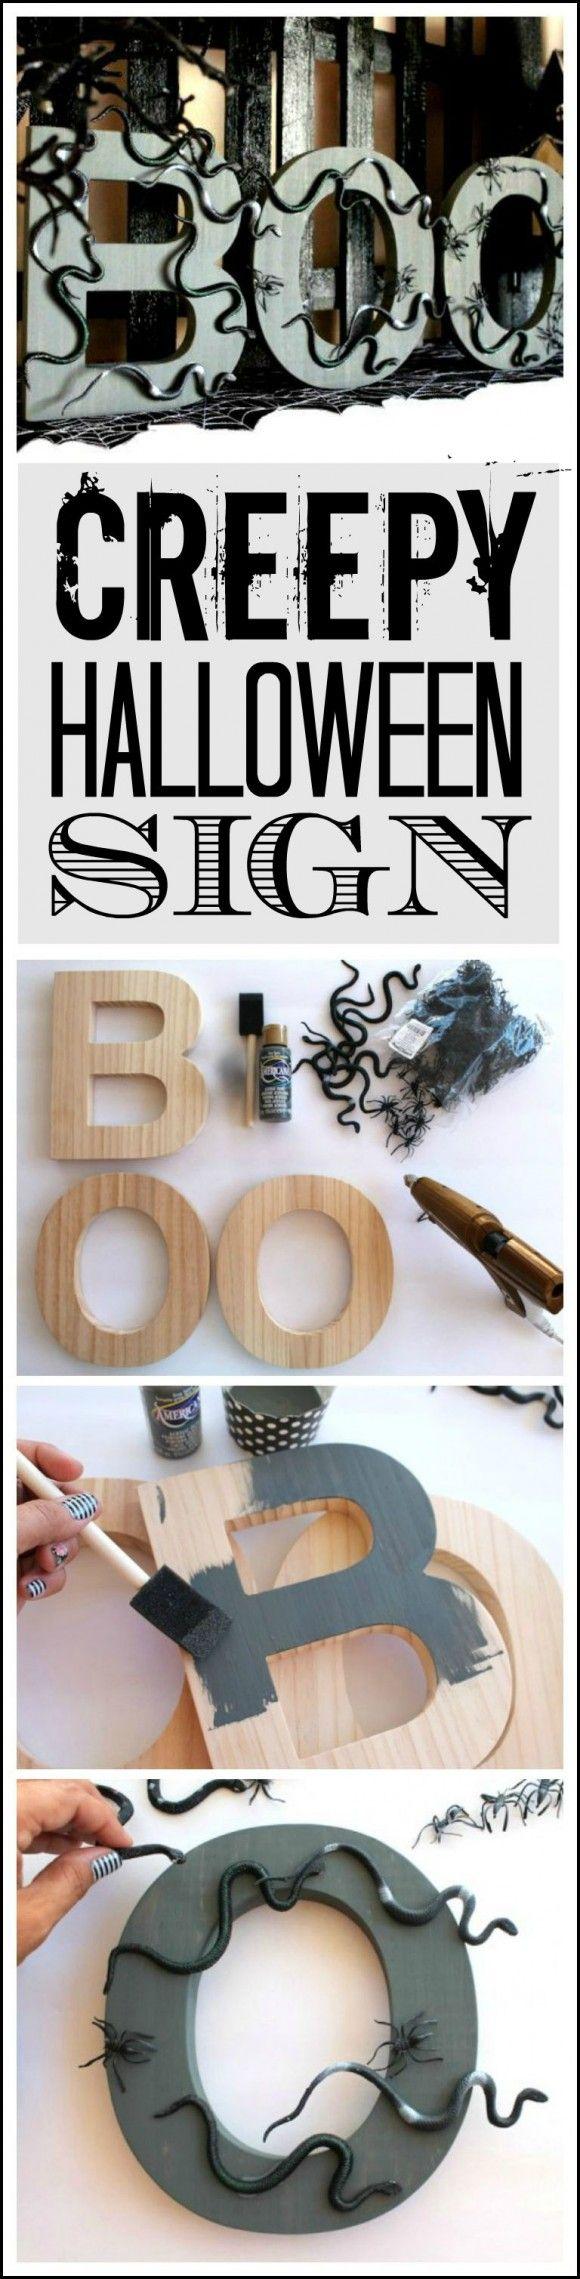 Creepy Halloween BOO Sign DIY | CatchMyParty.com